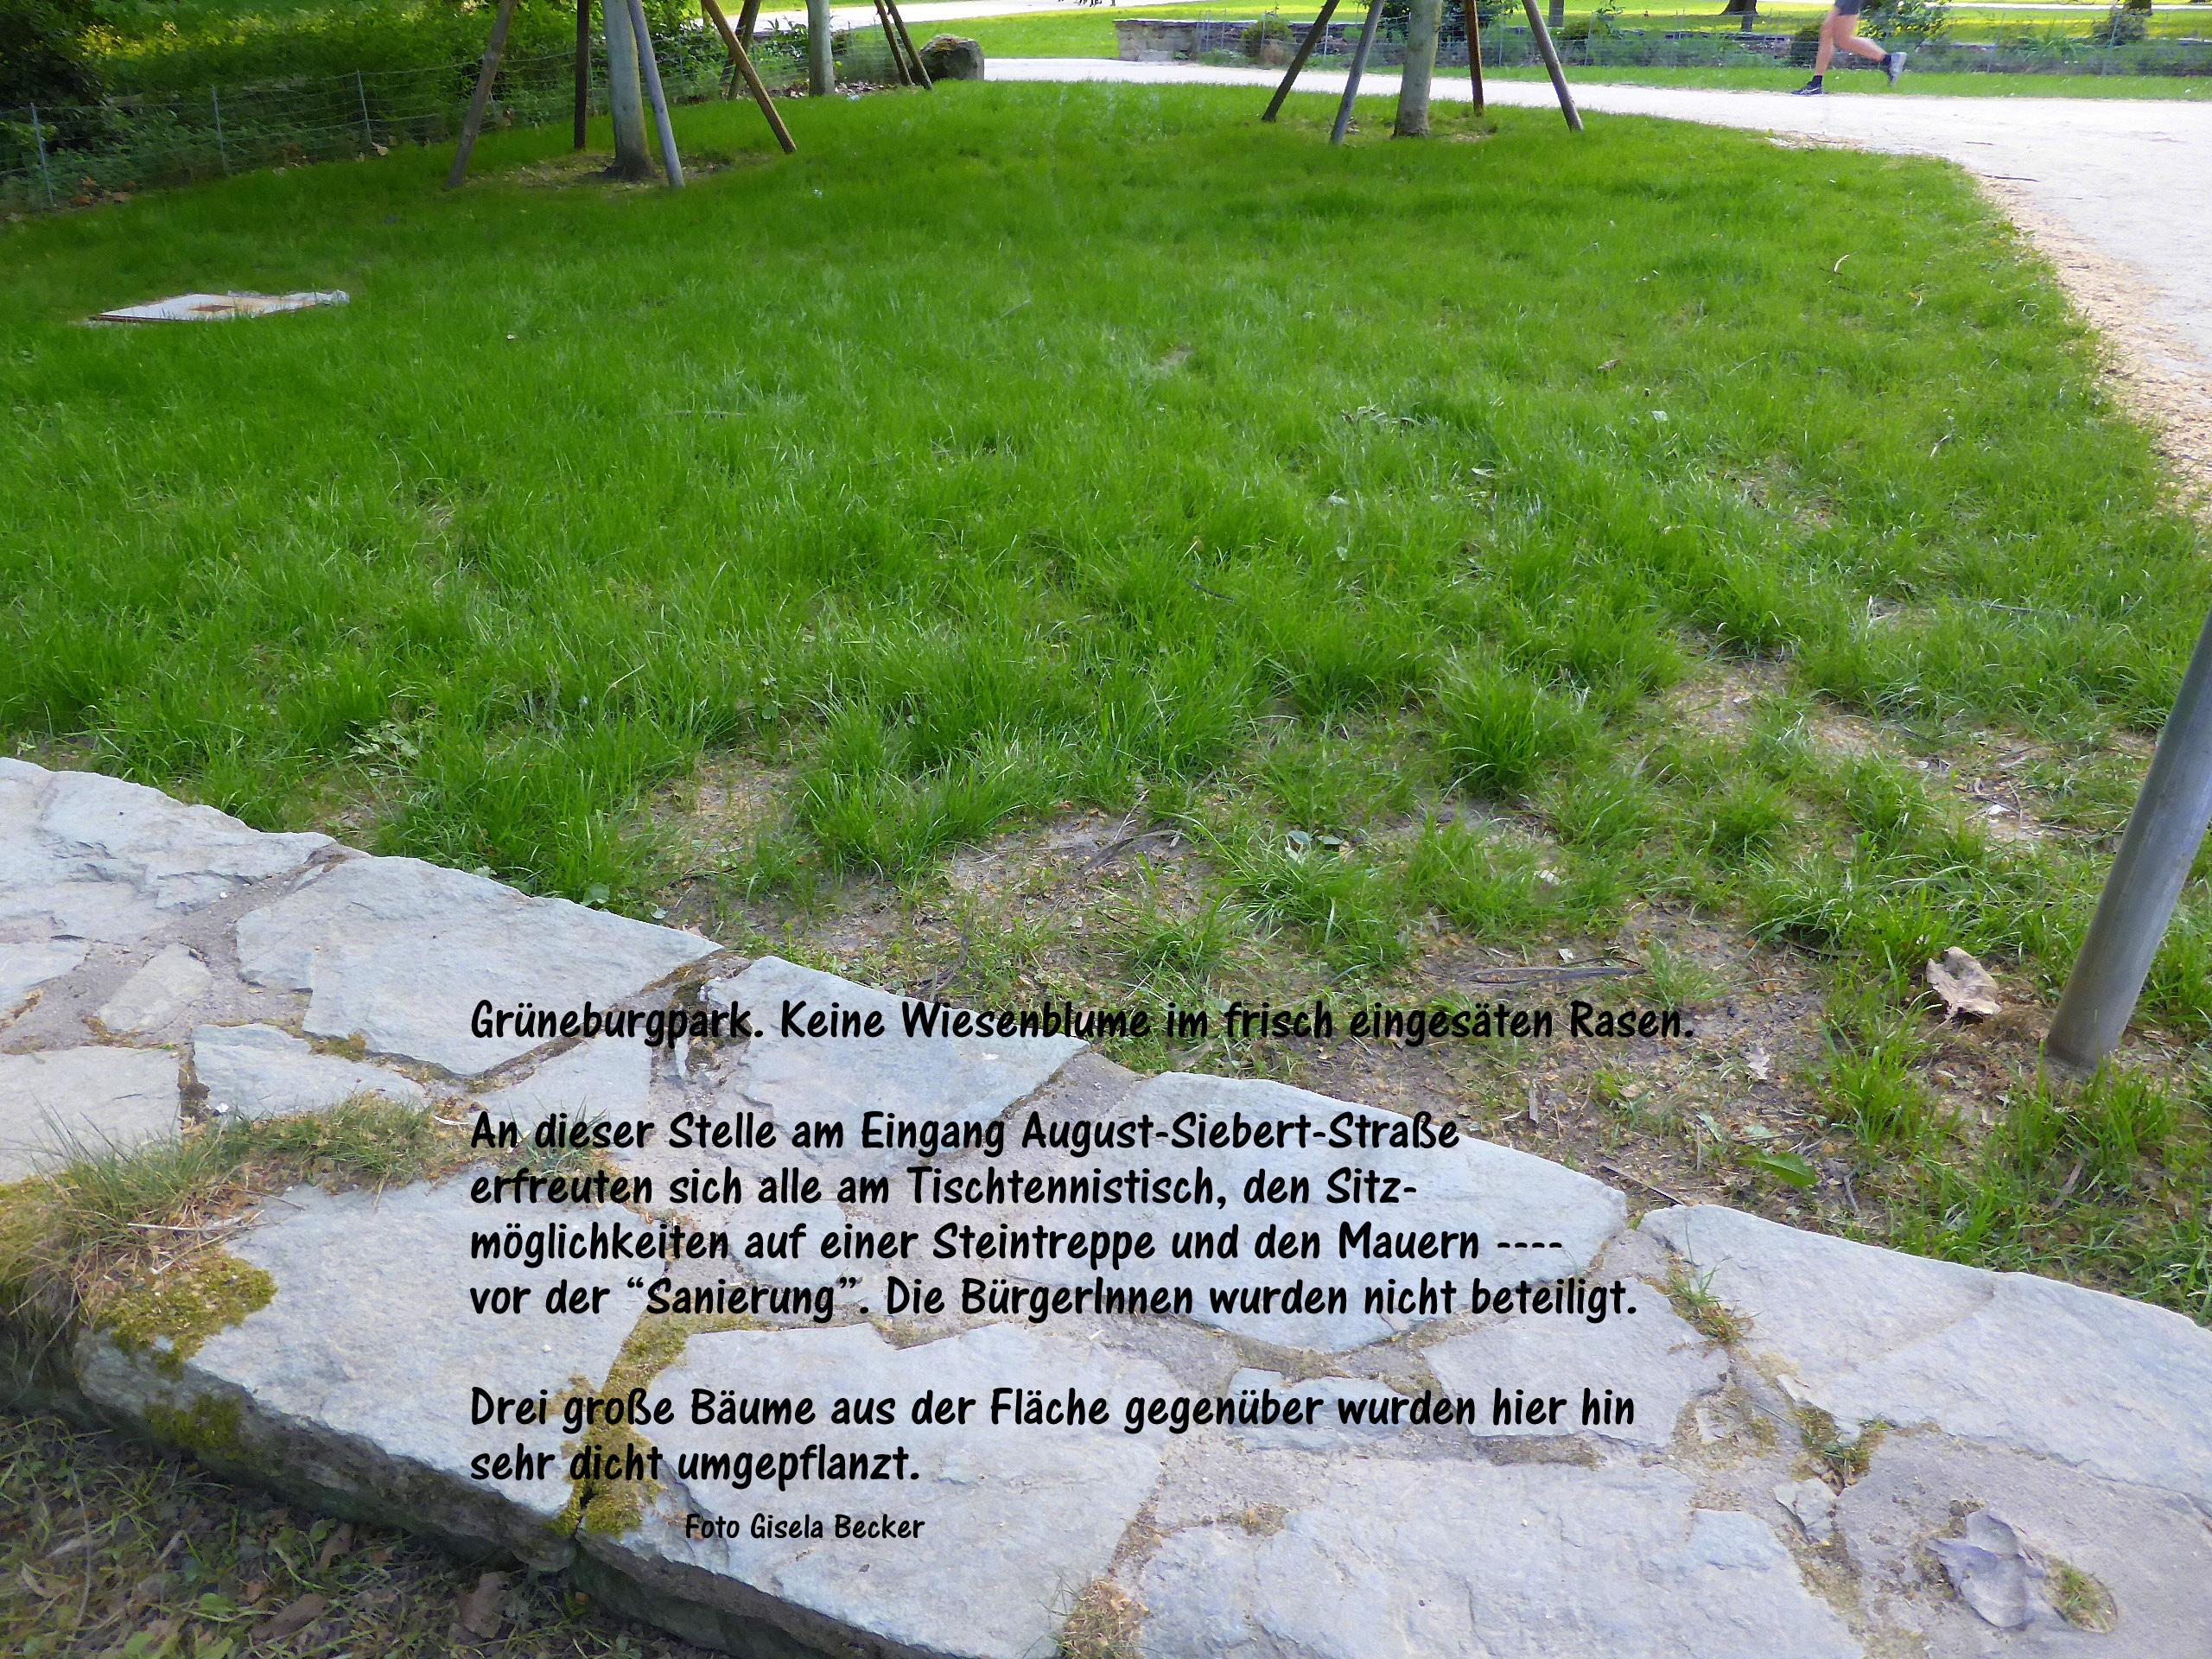 grueneburgparkinitiative mehr natur im park seite 3. Black Bedroom Furniture Sets. Home Design Ideas